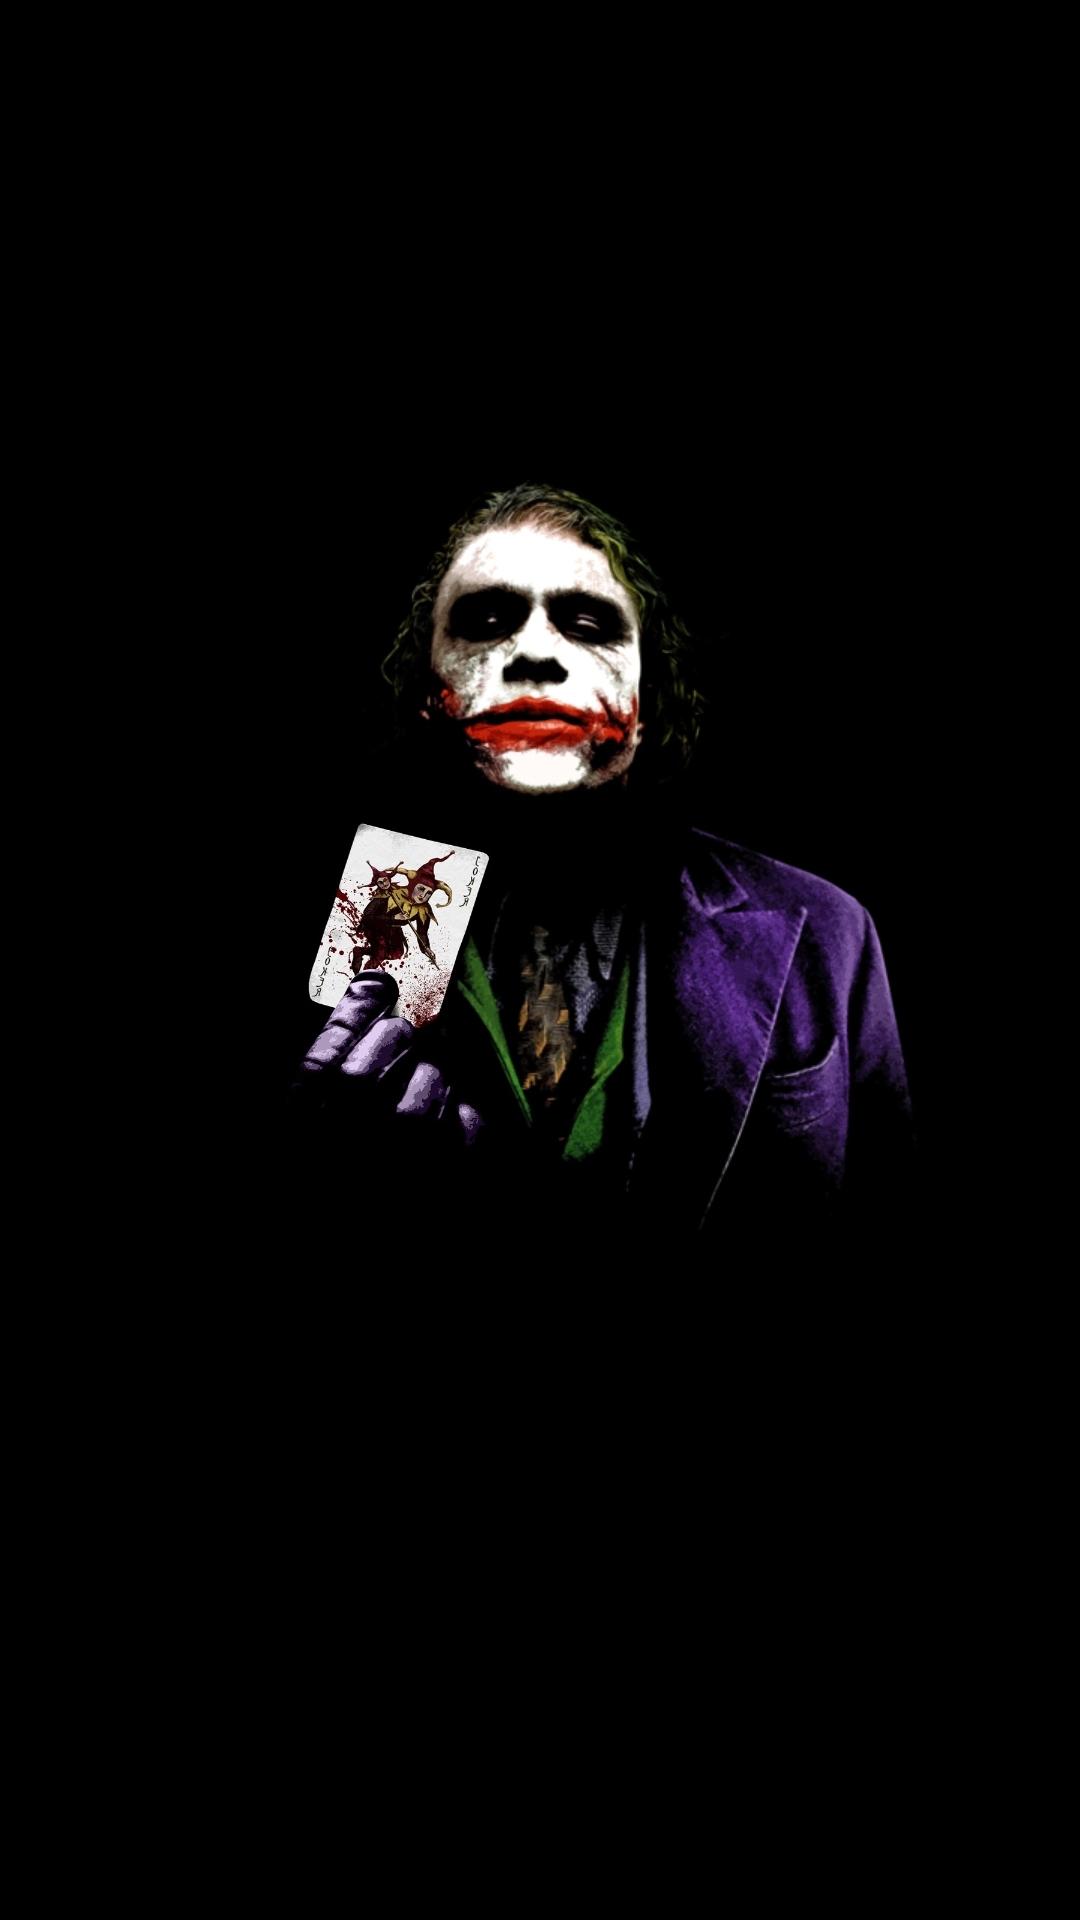 10 Latest The Joker Iphone Wallpaper Full Hd 1080p For Pc Background